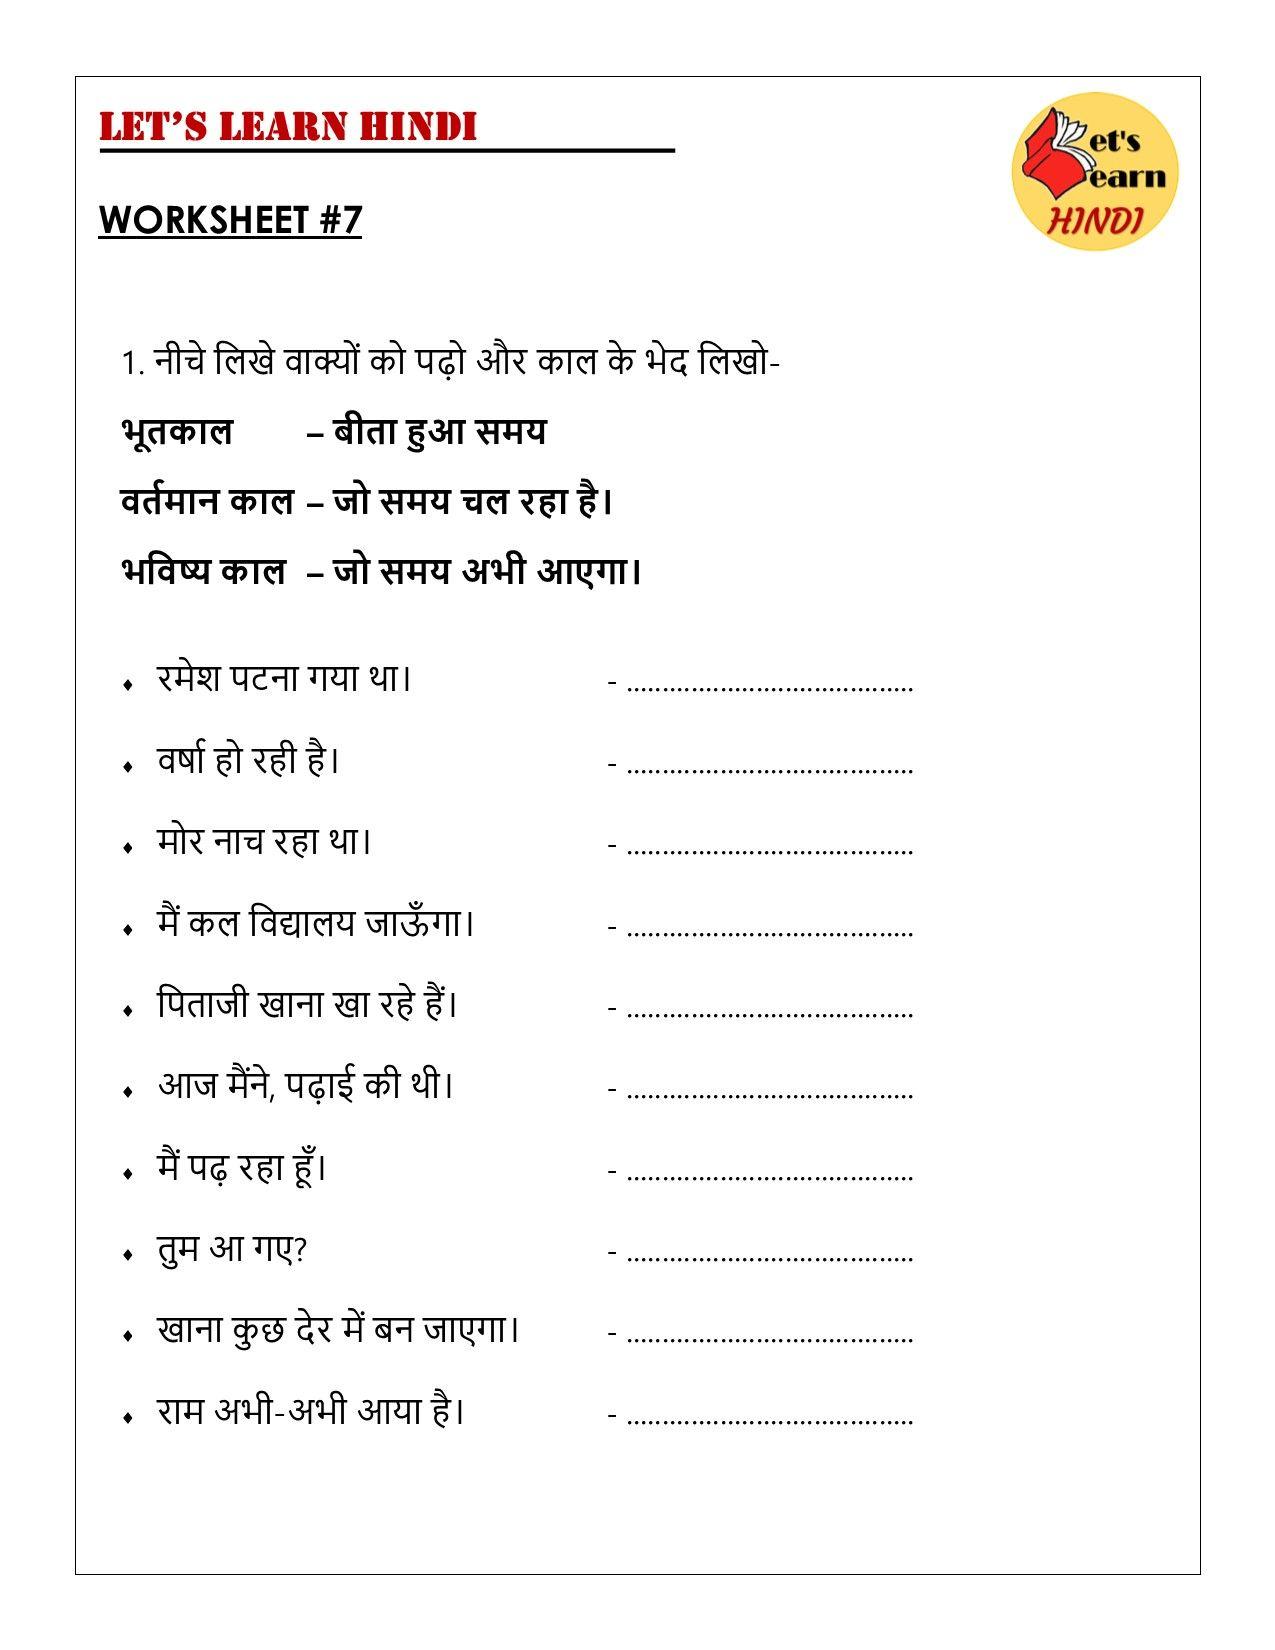 Hindi Tense Worksheet 7 Learn Hindi Hindi Alphabet Worksheets [ 1650 x 1275 Pixel ]